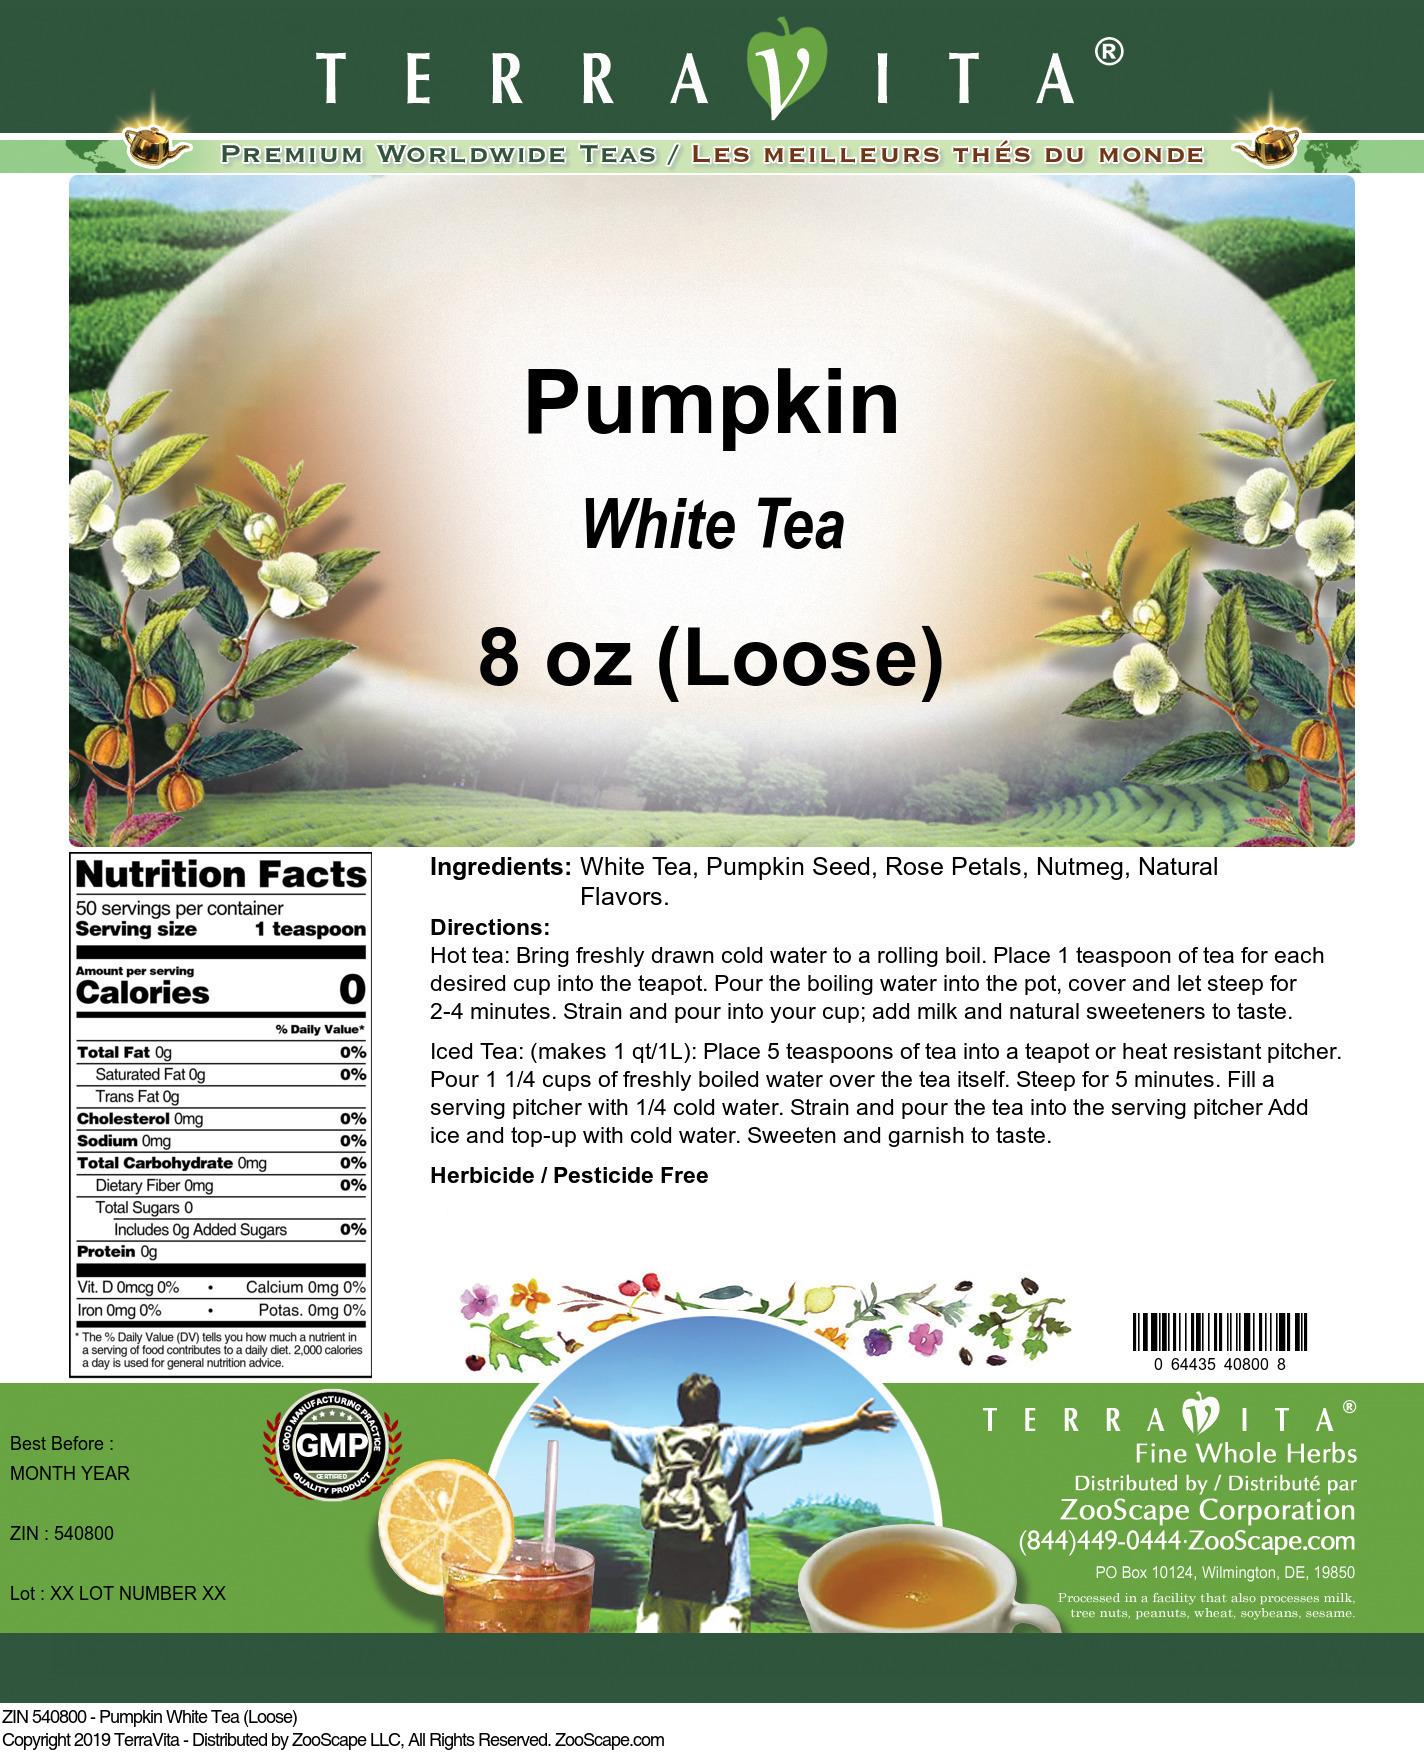 Pumpkin White Tea (Loose)